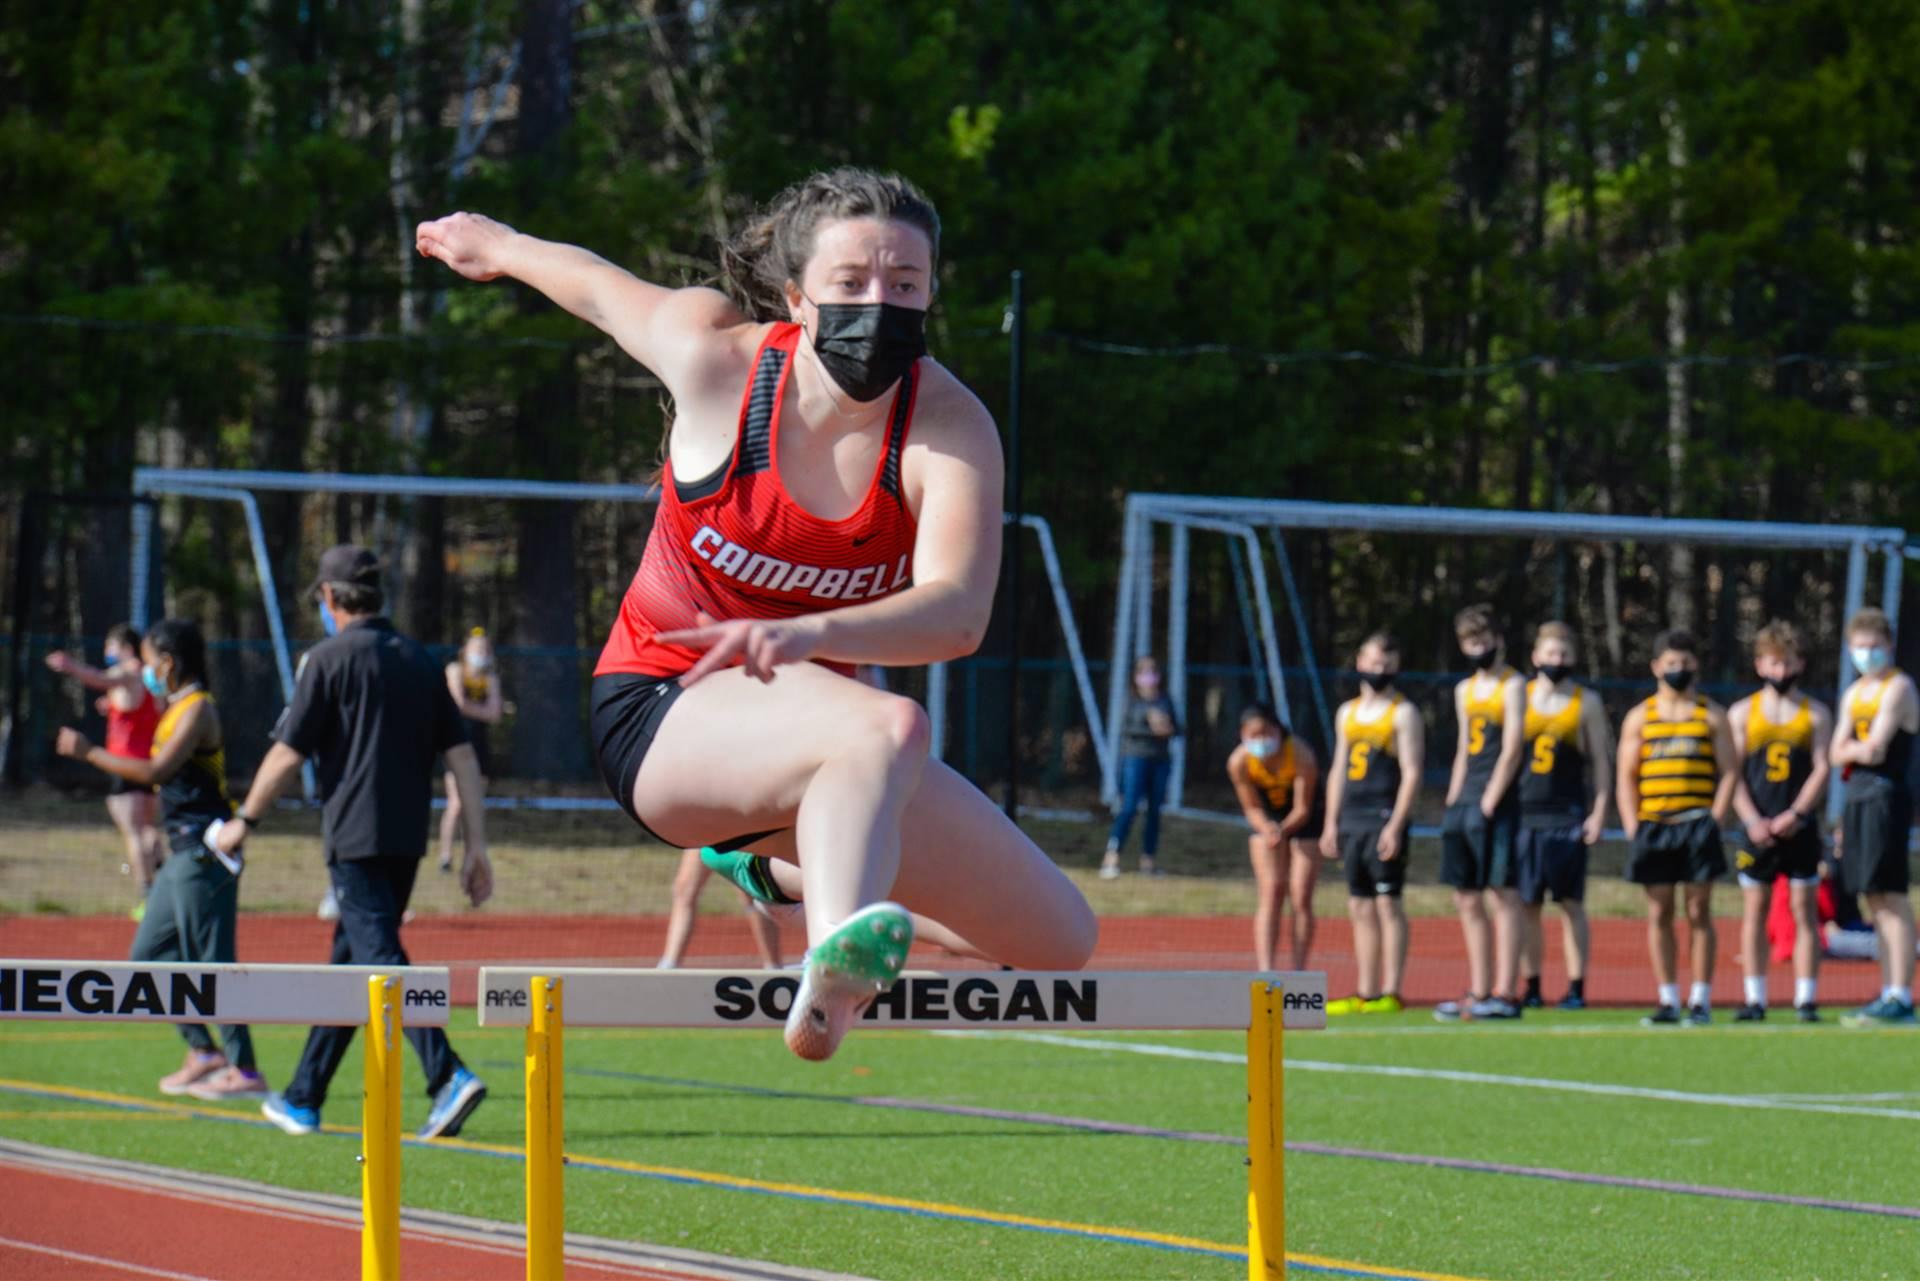 Tori hurdles